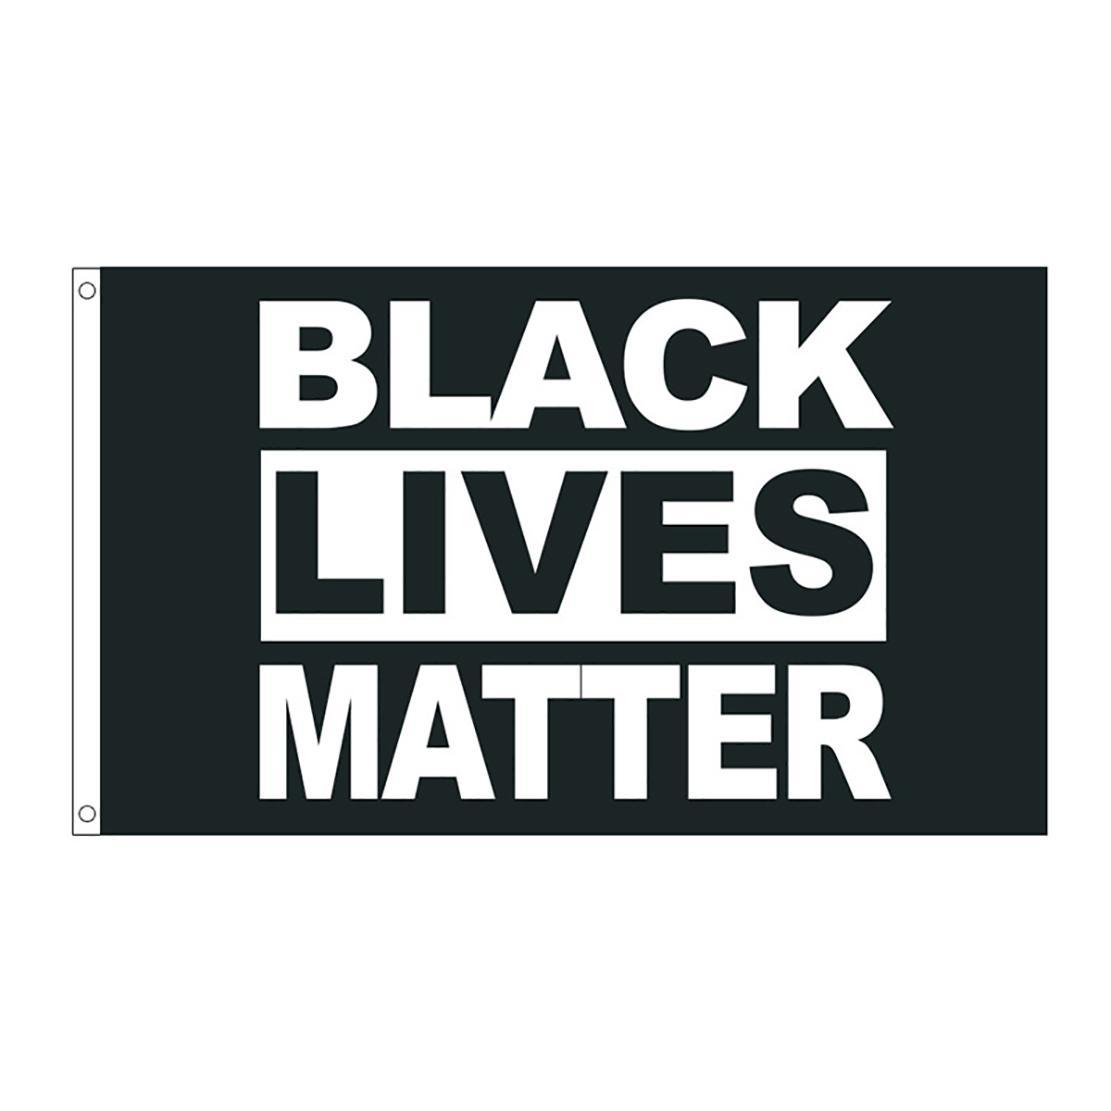 50pcs direkte Fabrik Großhandel 90 * 150cm 3x5 fts Schwarz Lives Matter Flagge BLM Frieden Protest Außen Banner